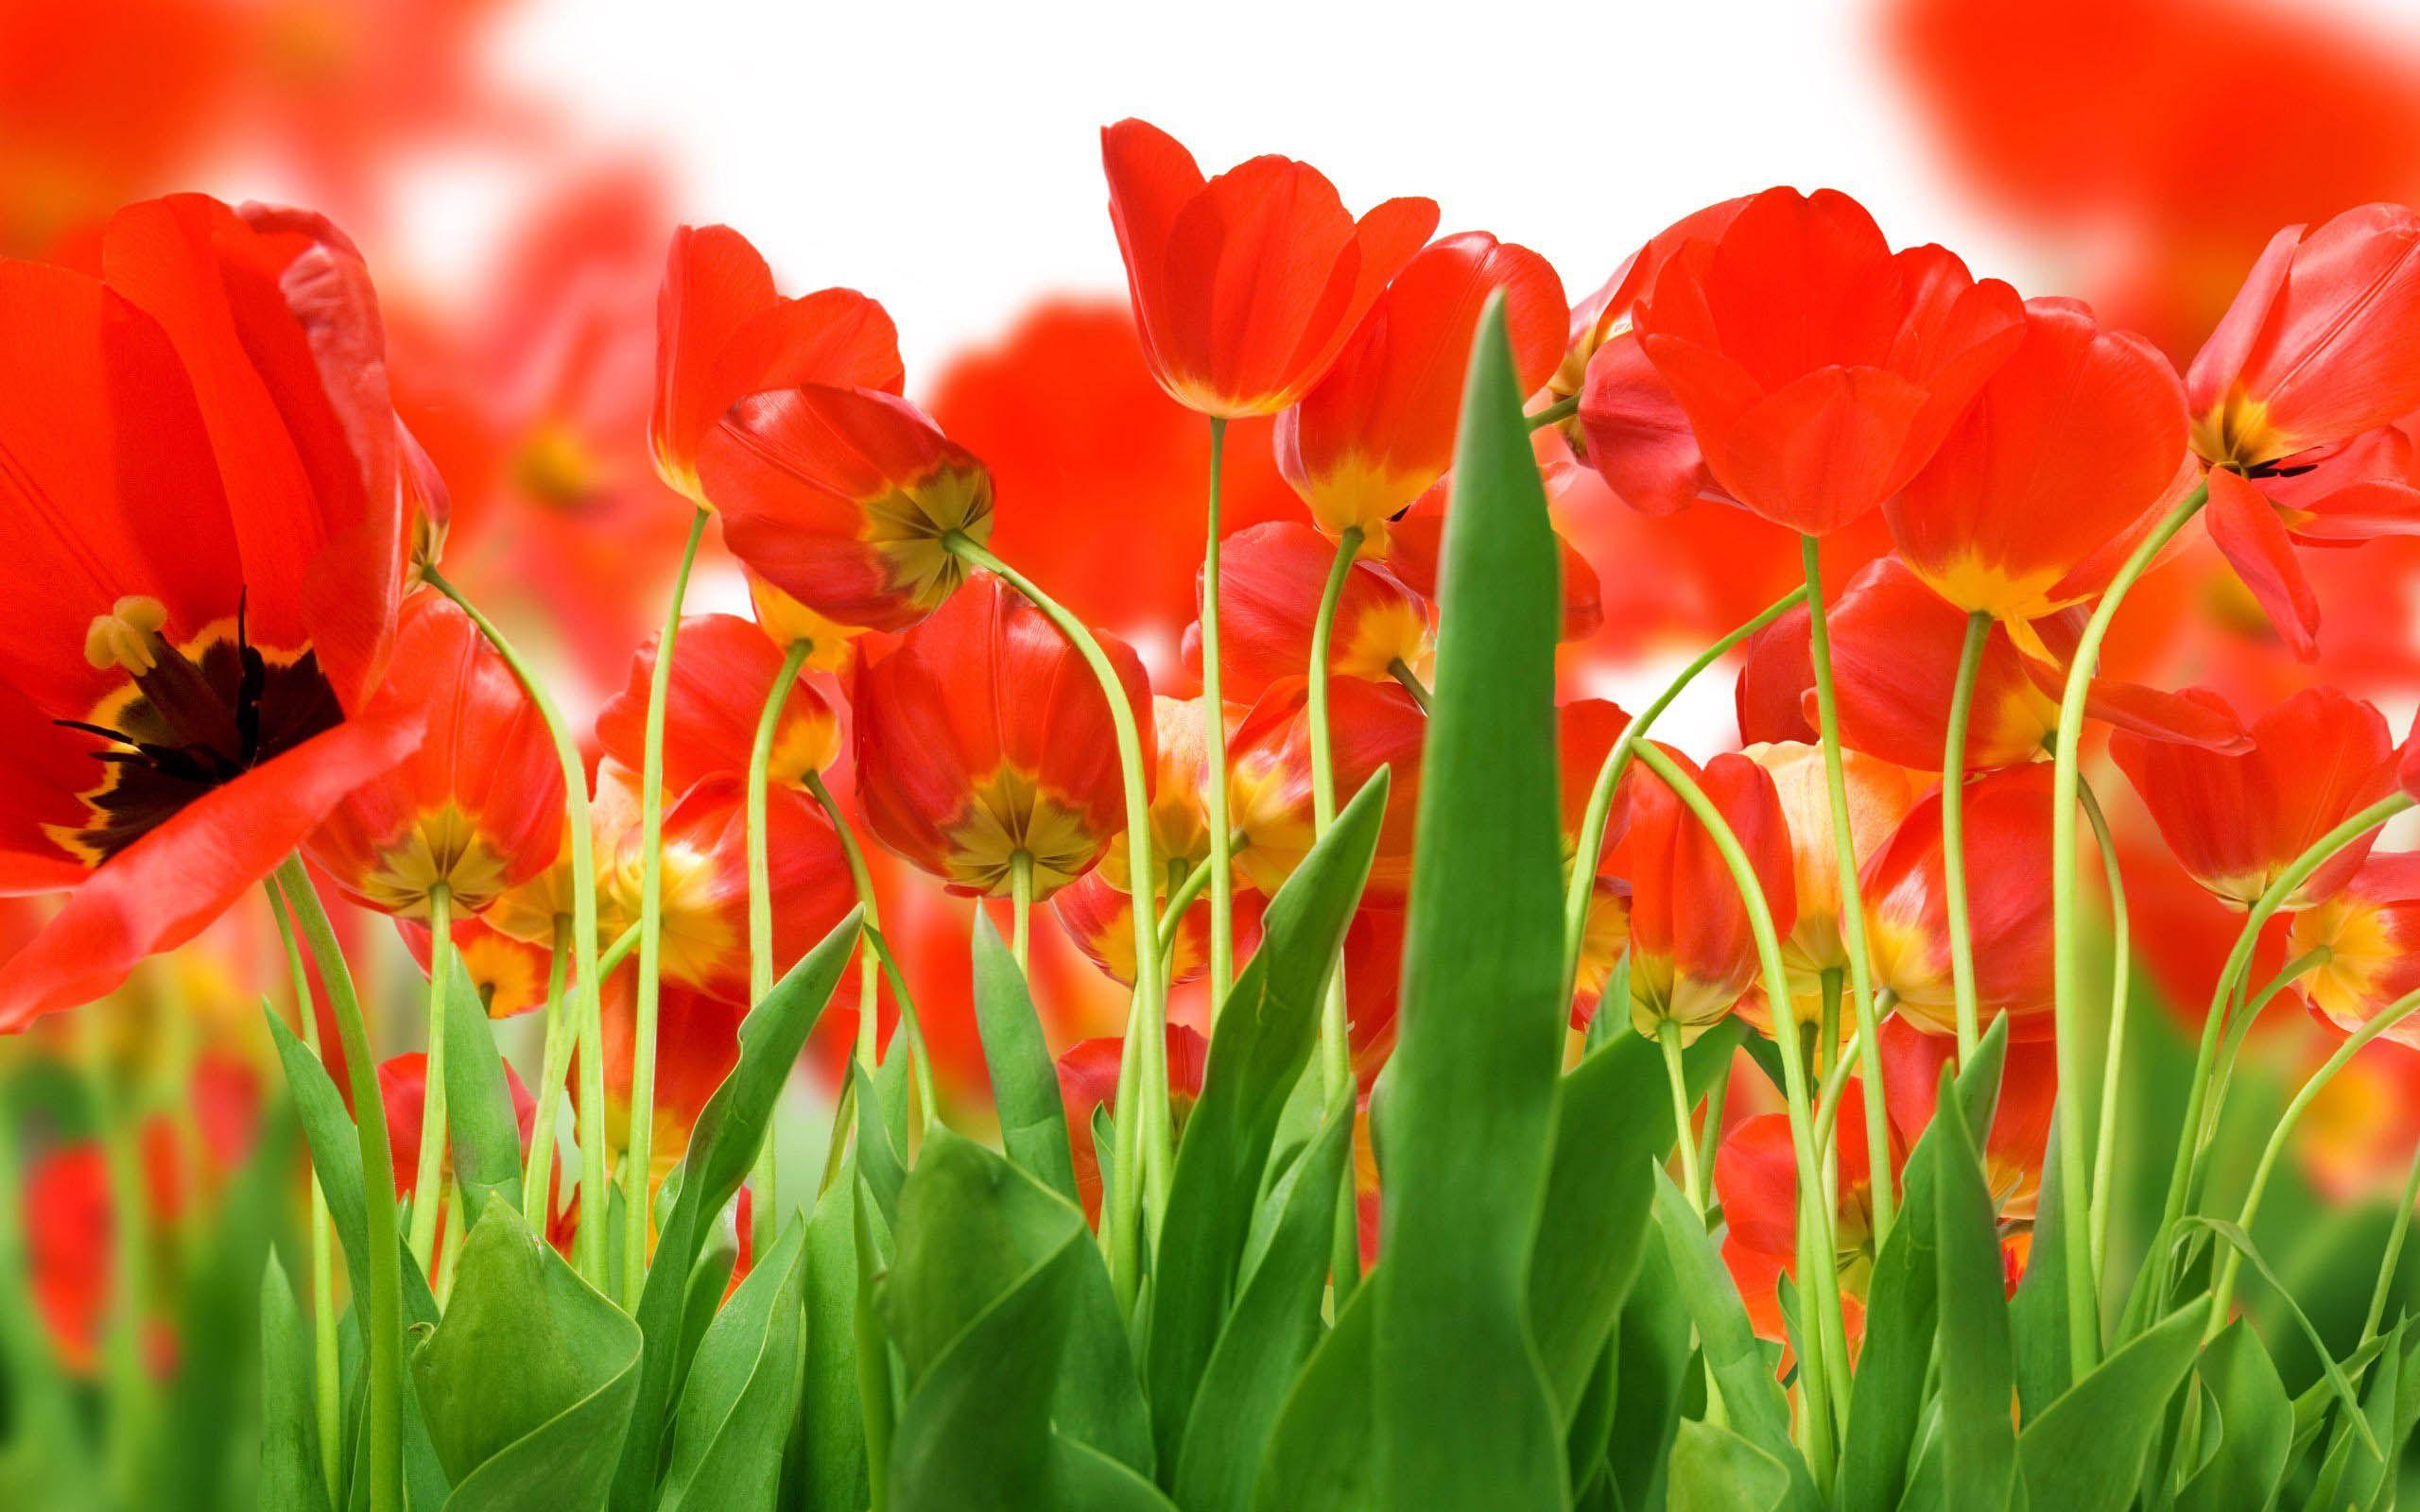 Awesome Flowers Wallpaper Desktop Background Full Screen 2560x1600 Download Hd Wallpaper Wallpapertip